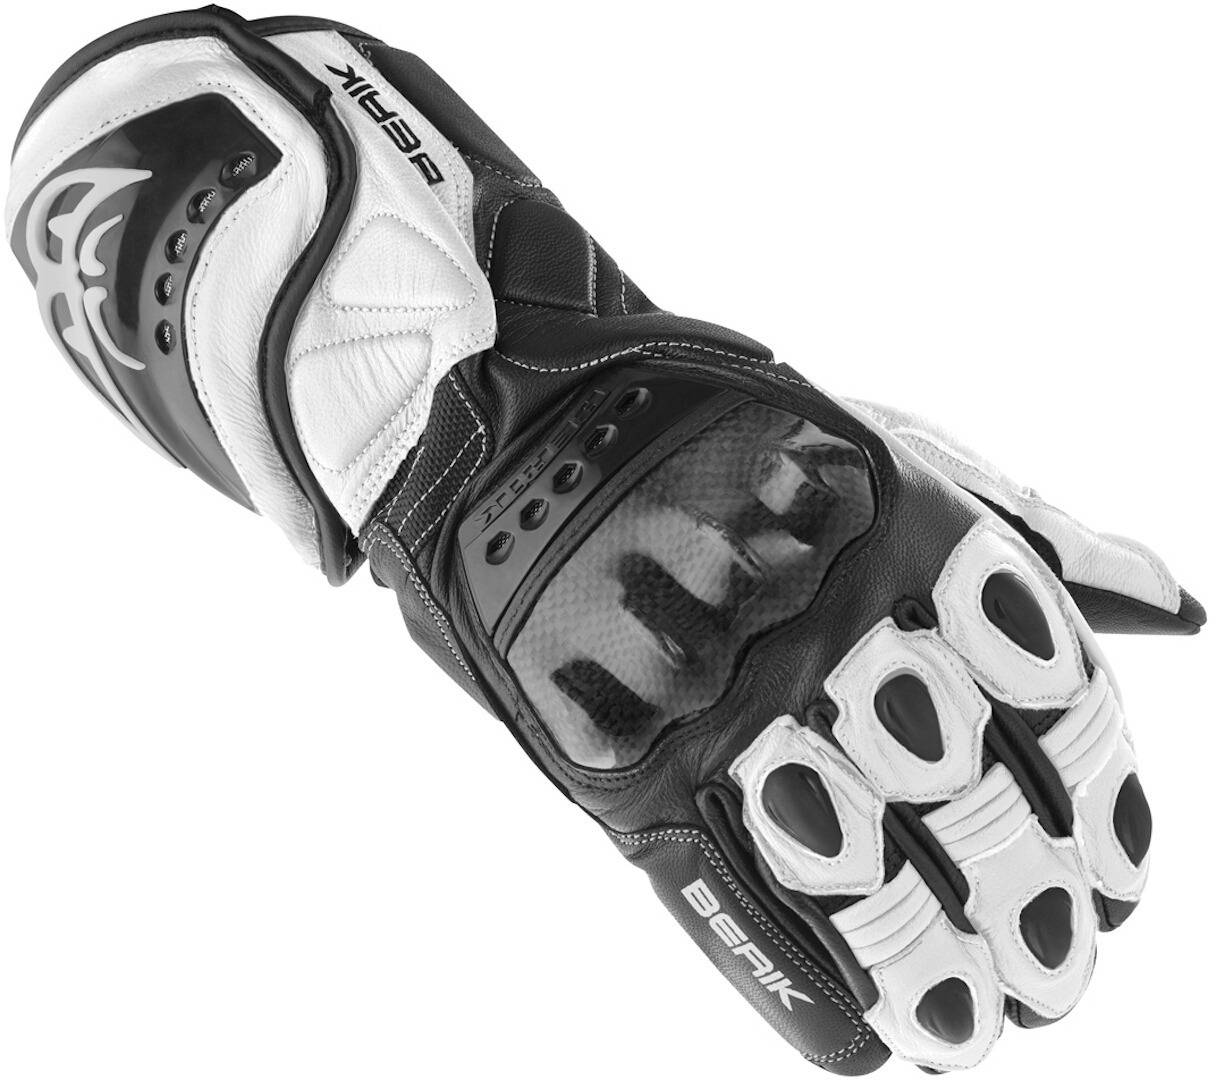 Berik TX-1 Gants de moto Noir Blanc taille : 2XL